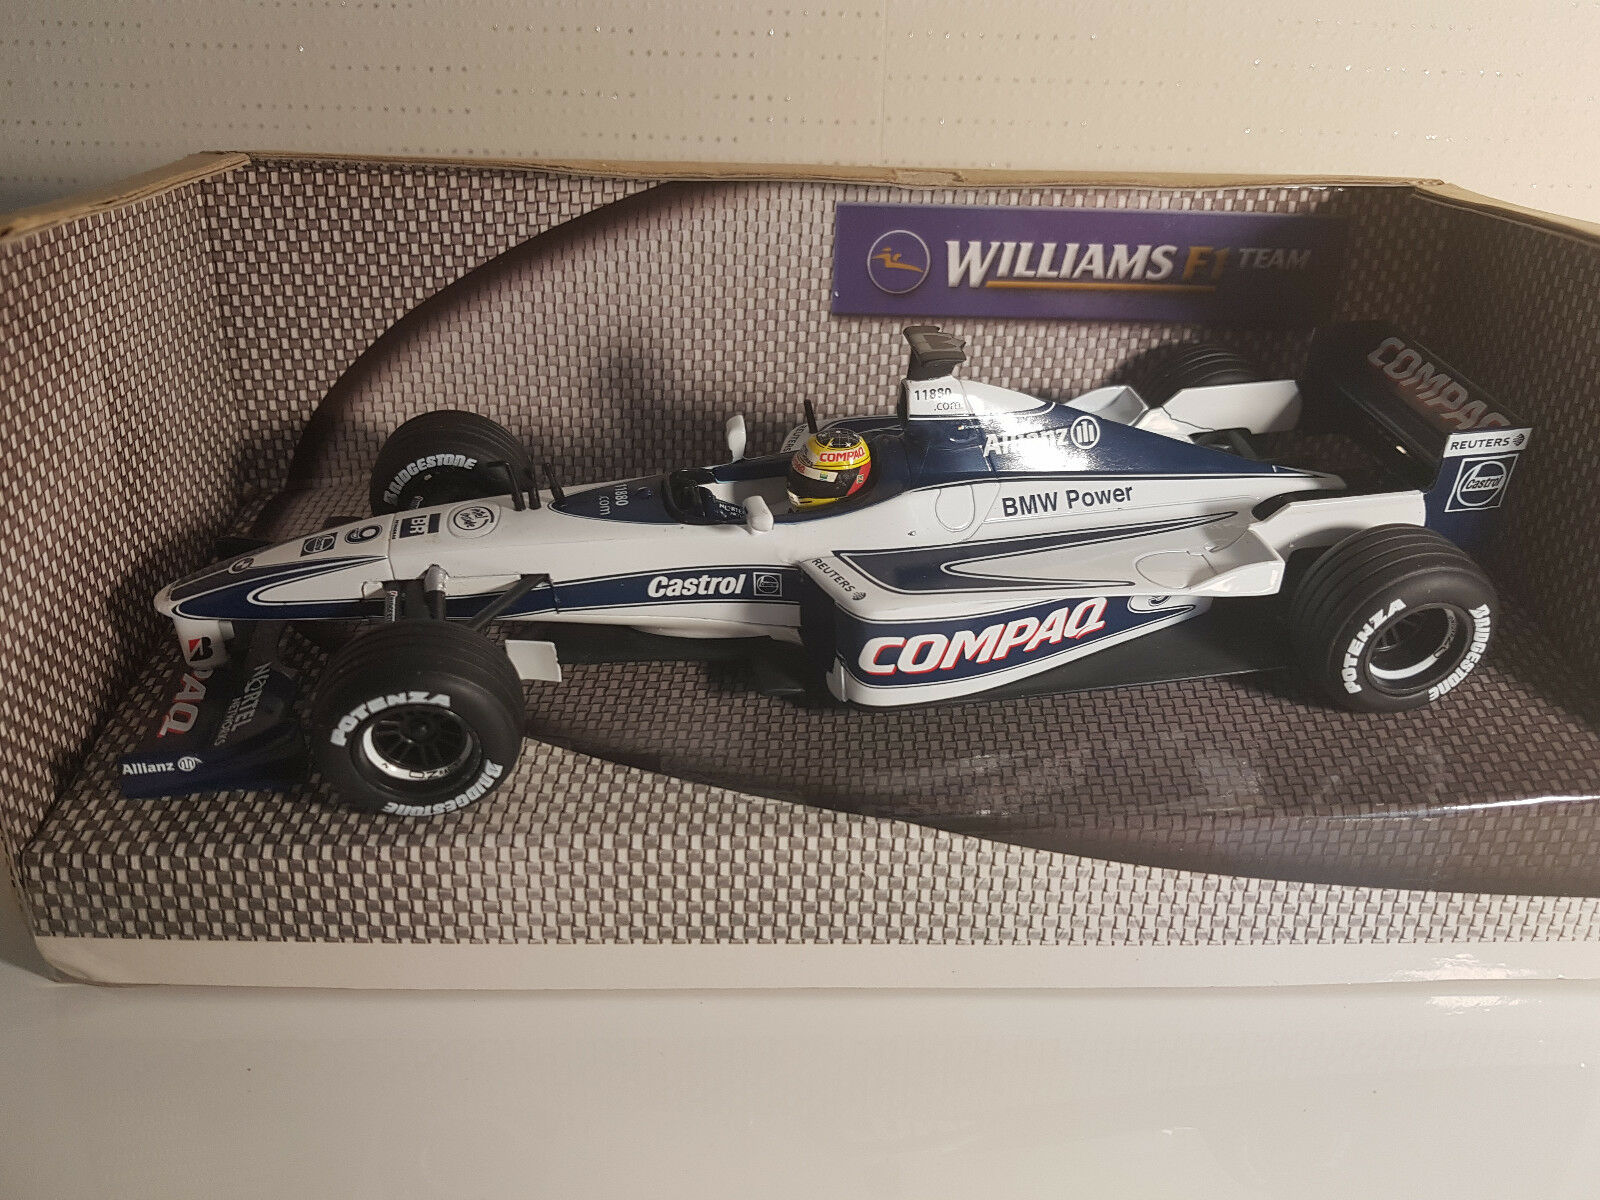 Hot Wheels formule 1 Williams Bmw Fw22 Ralf Schumacher 2000 1 24 neuf